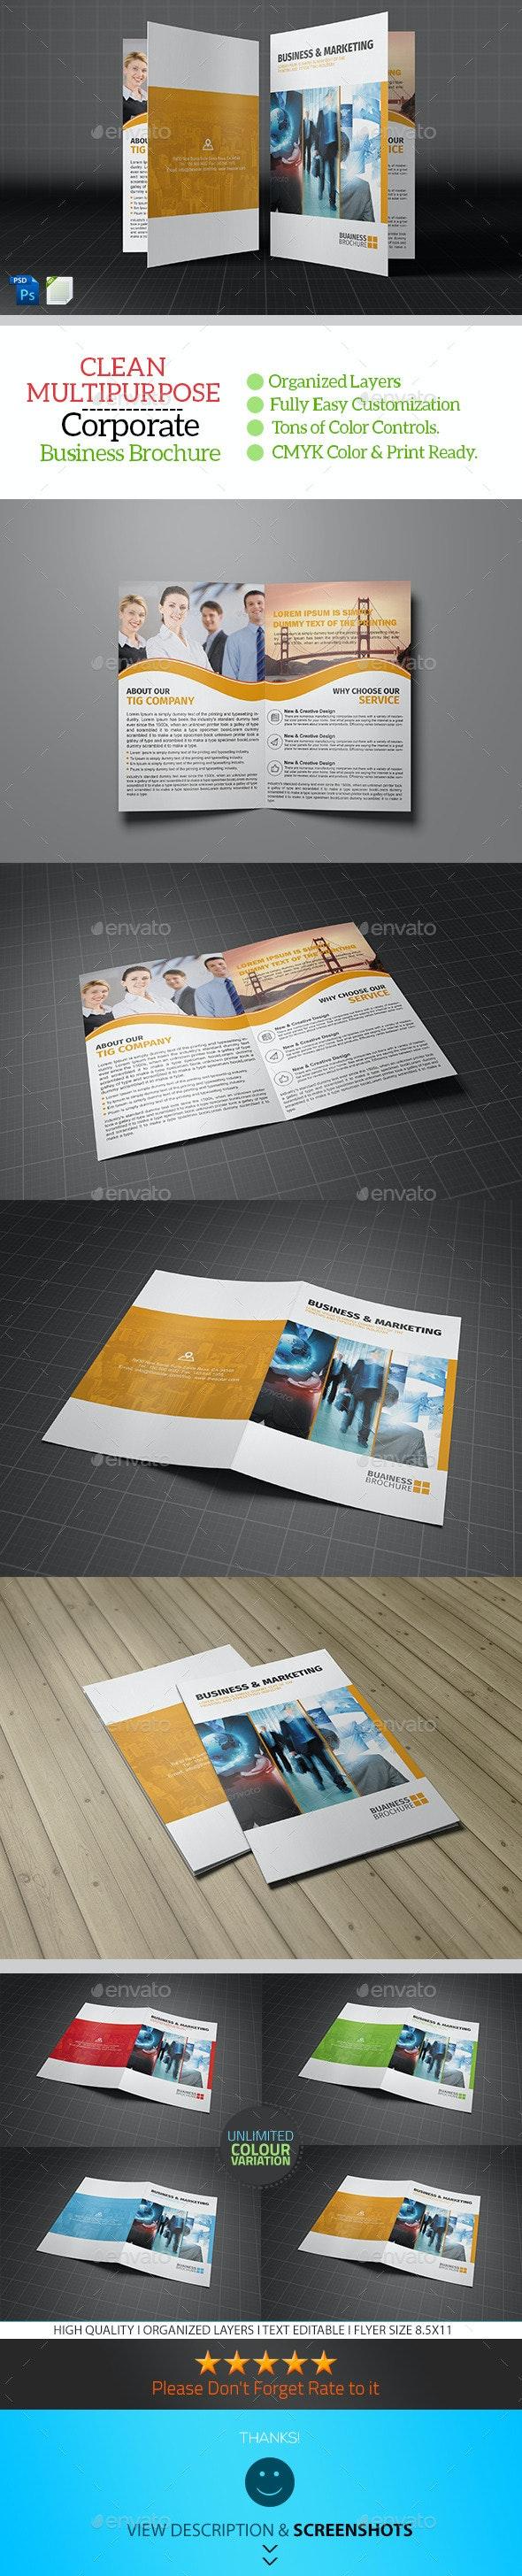 Corporate Bifold Brochure Template Vol02 - Corporate Brochures